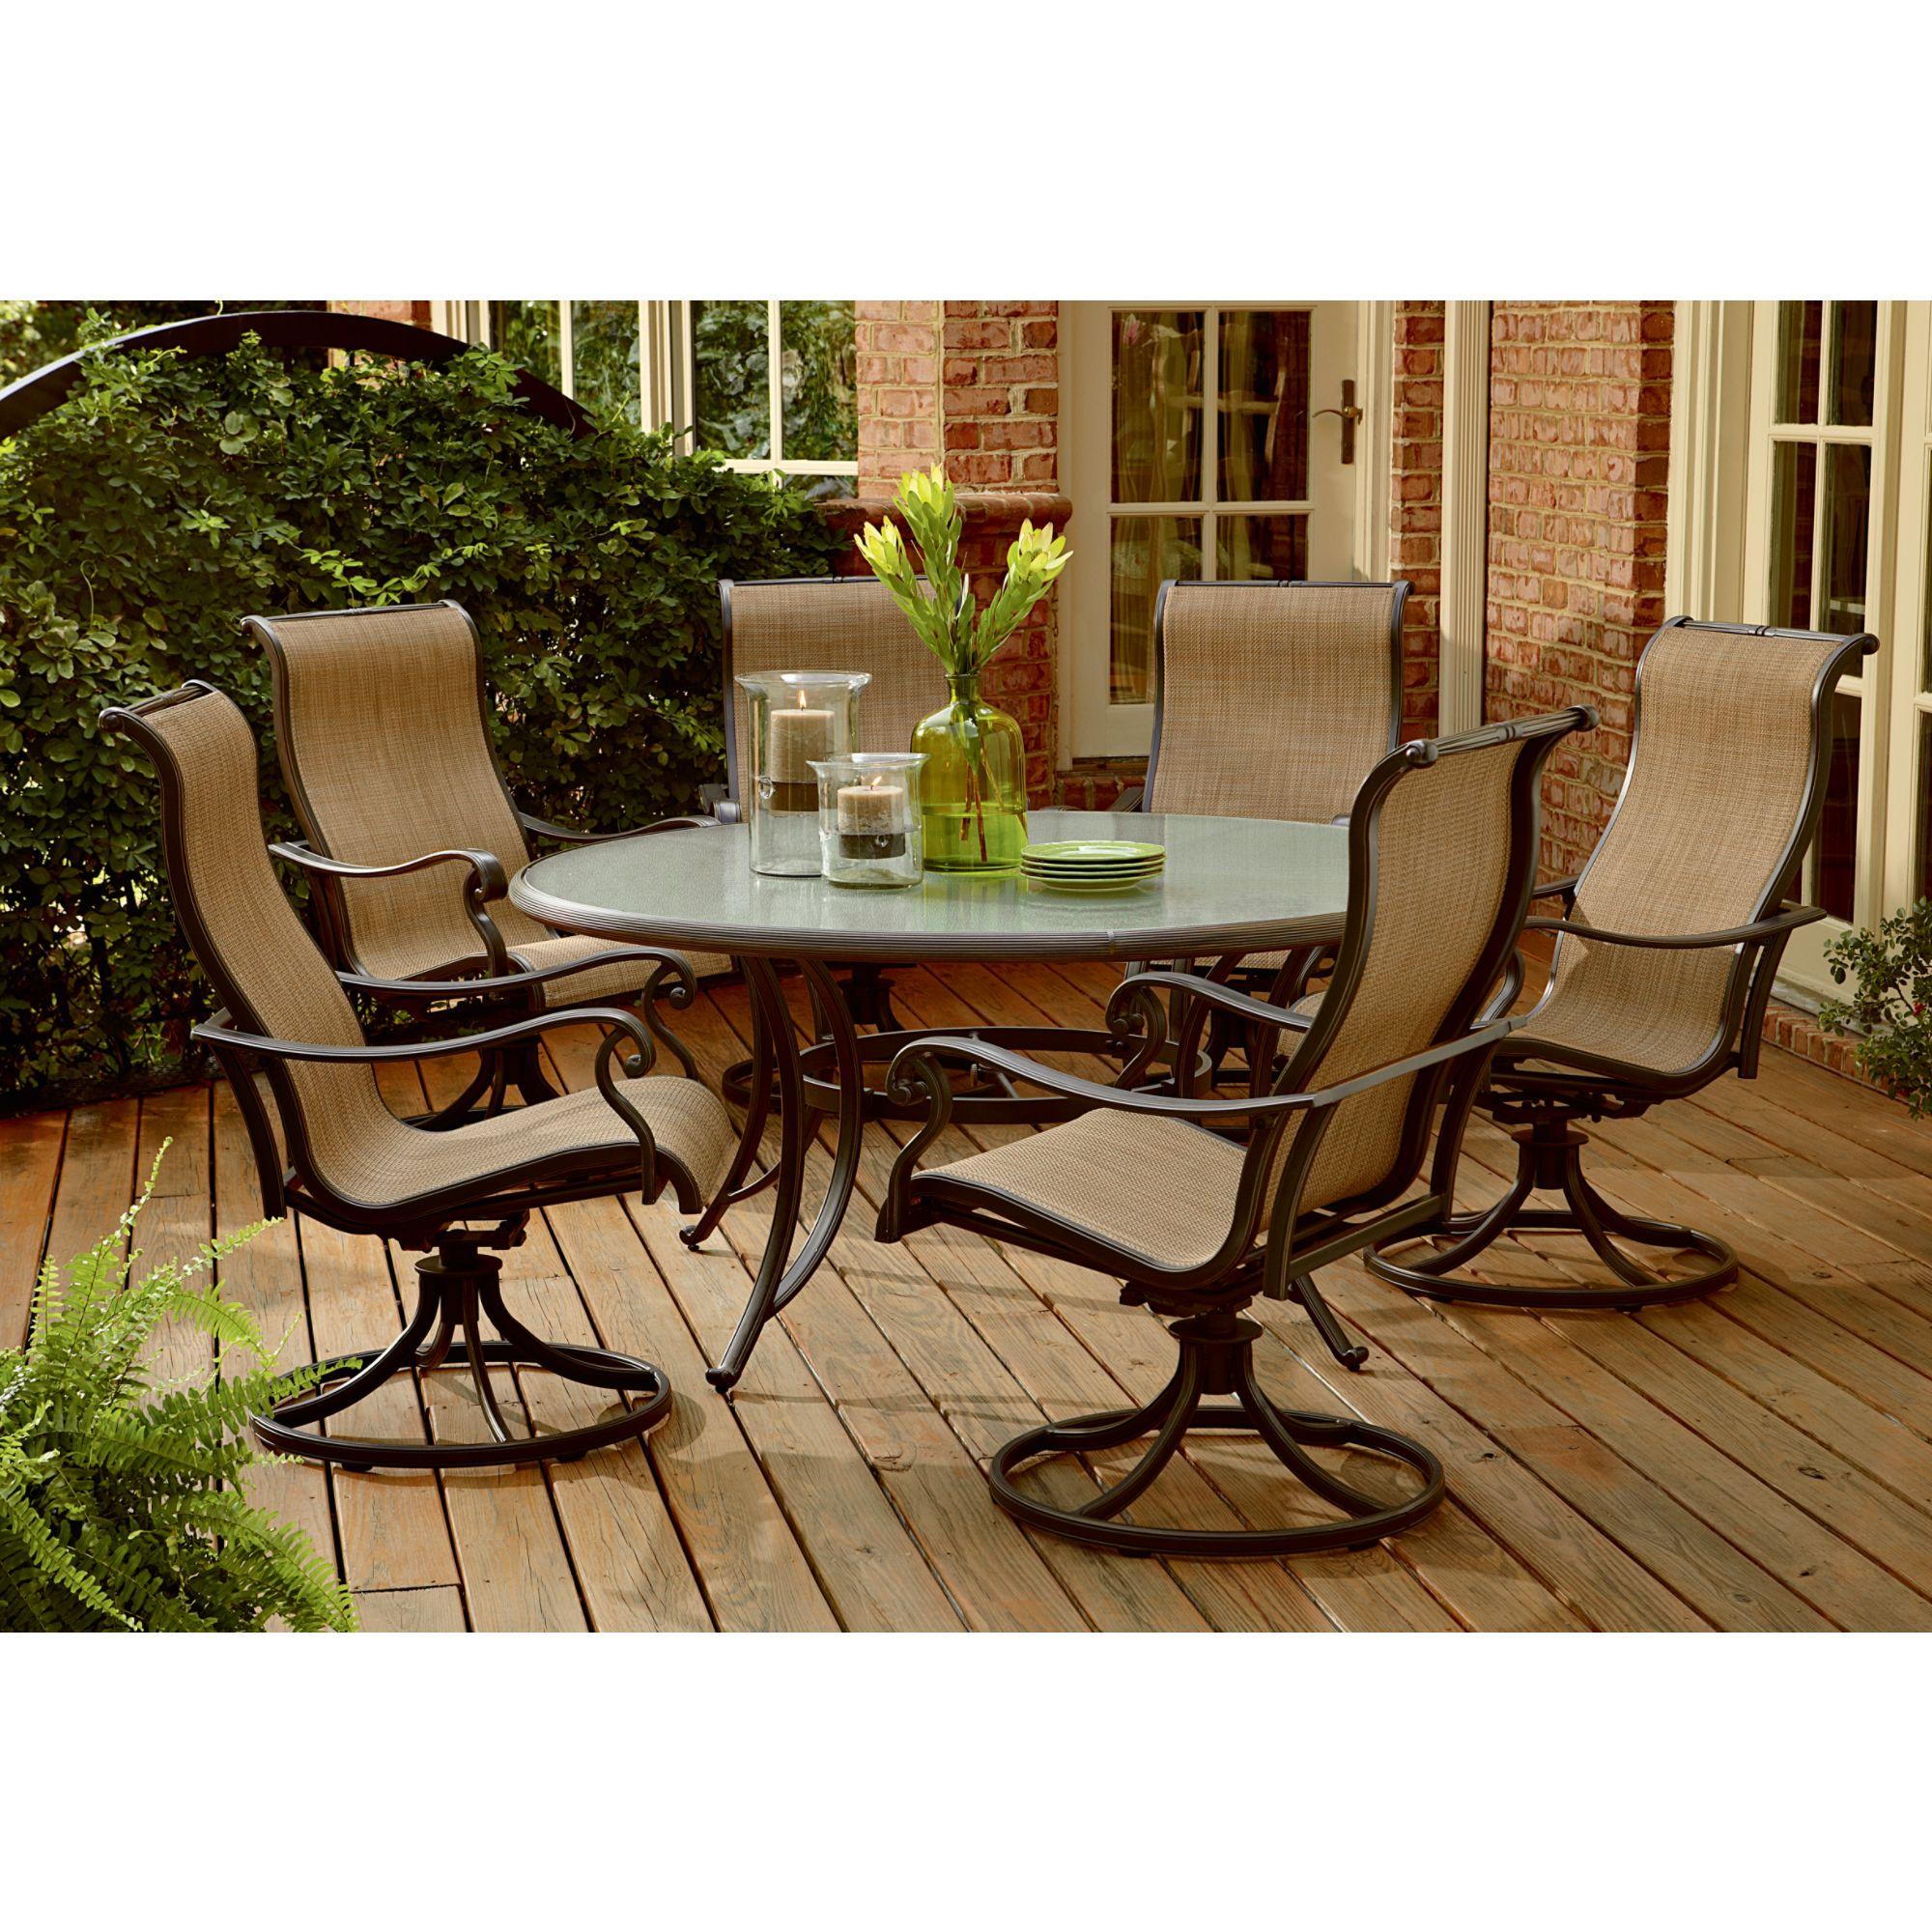 agio international panorama 7 pc glass dining set on Agio Patio Furniture id=33440